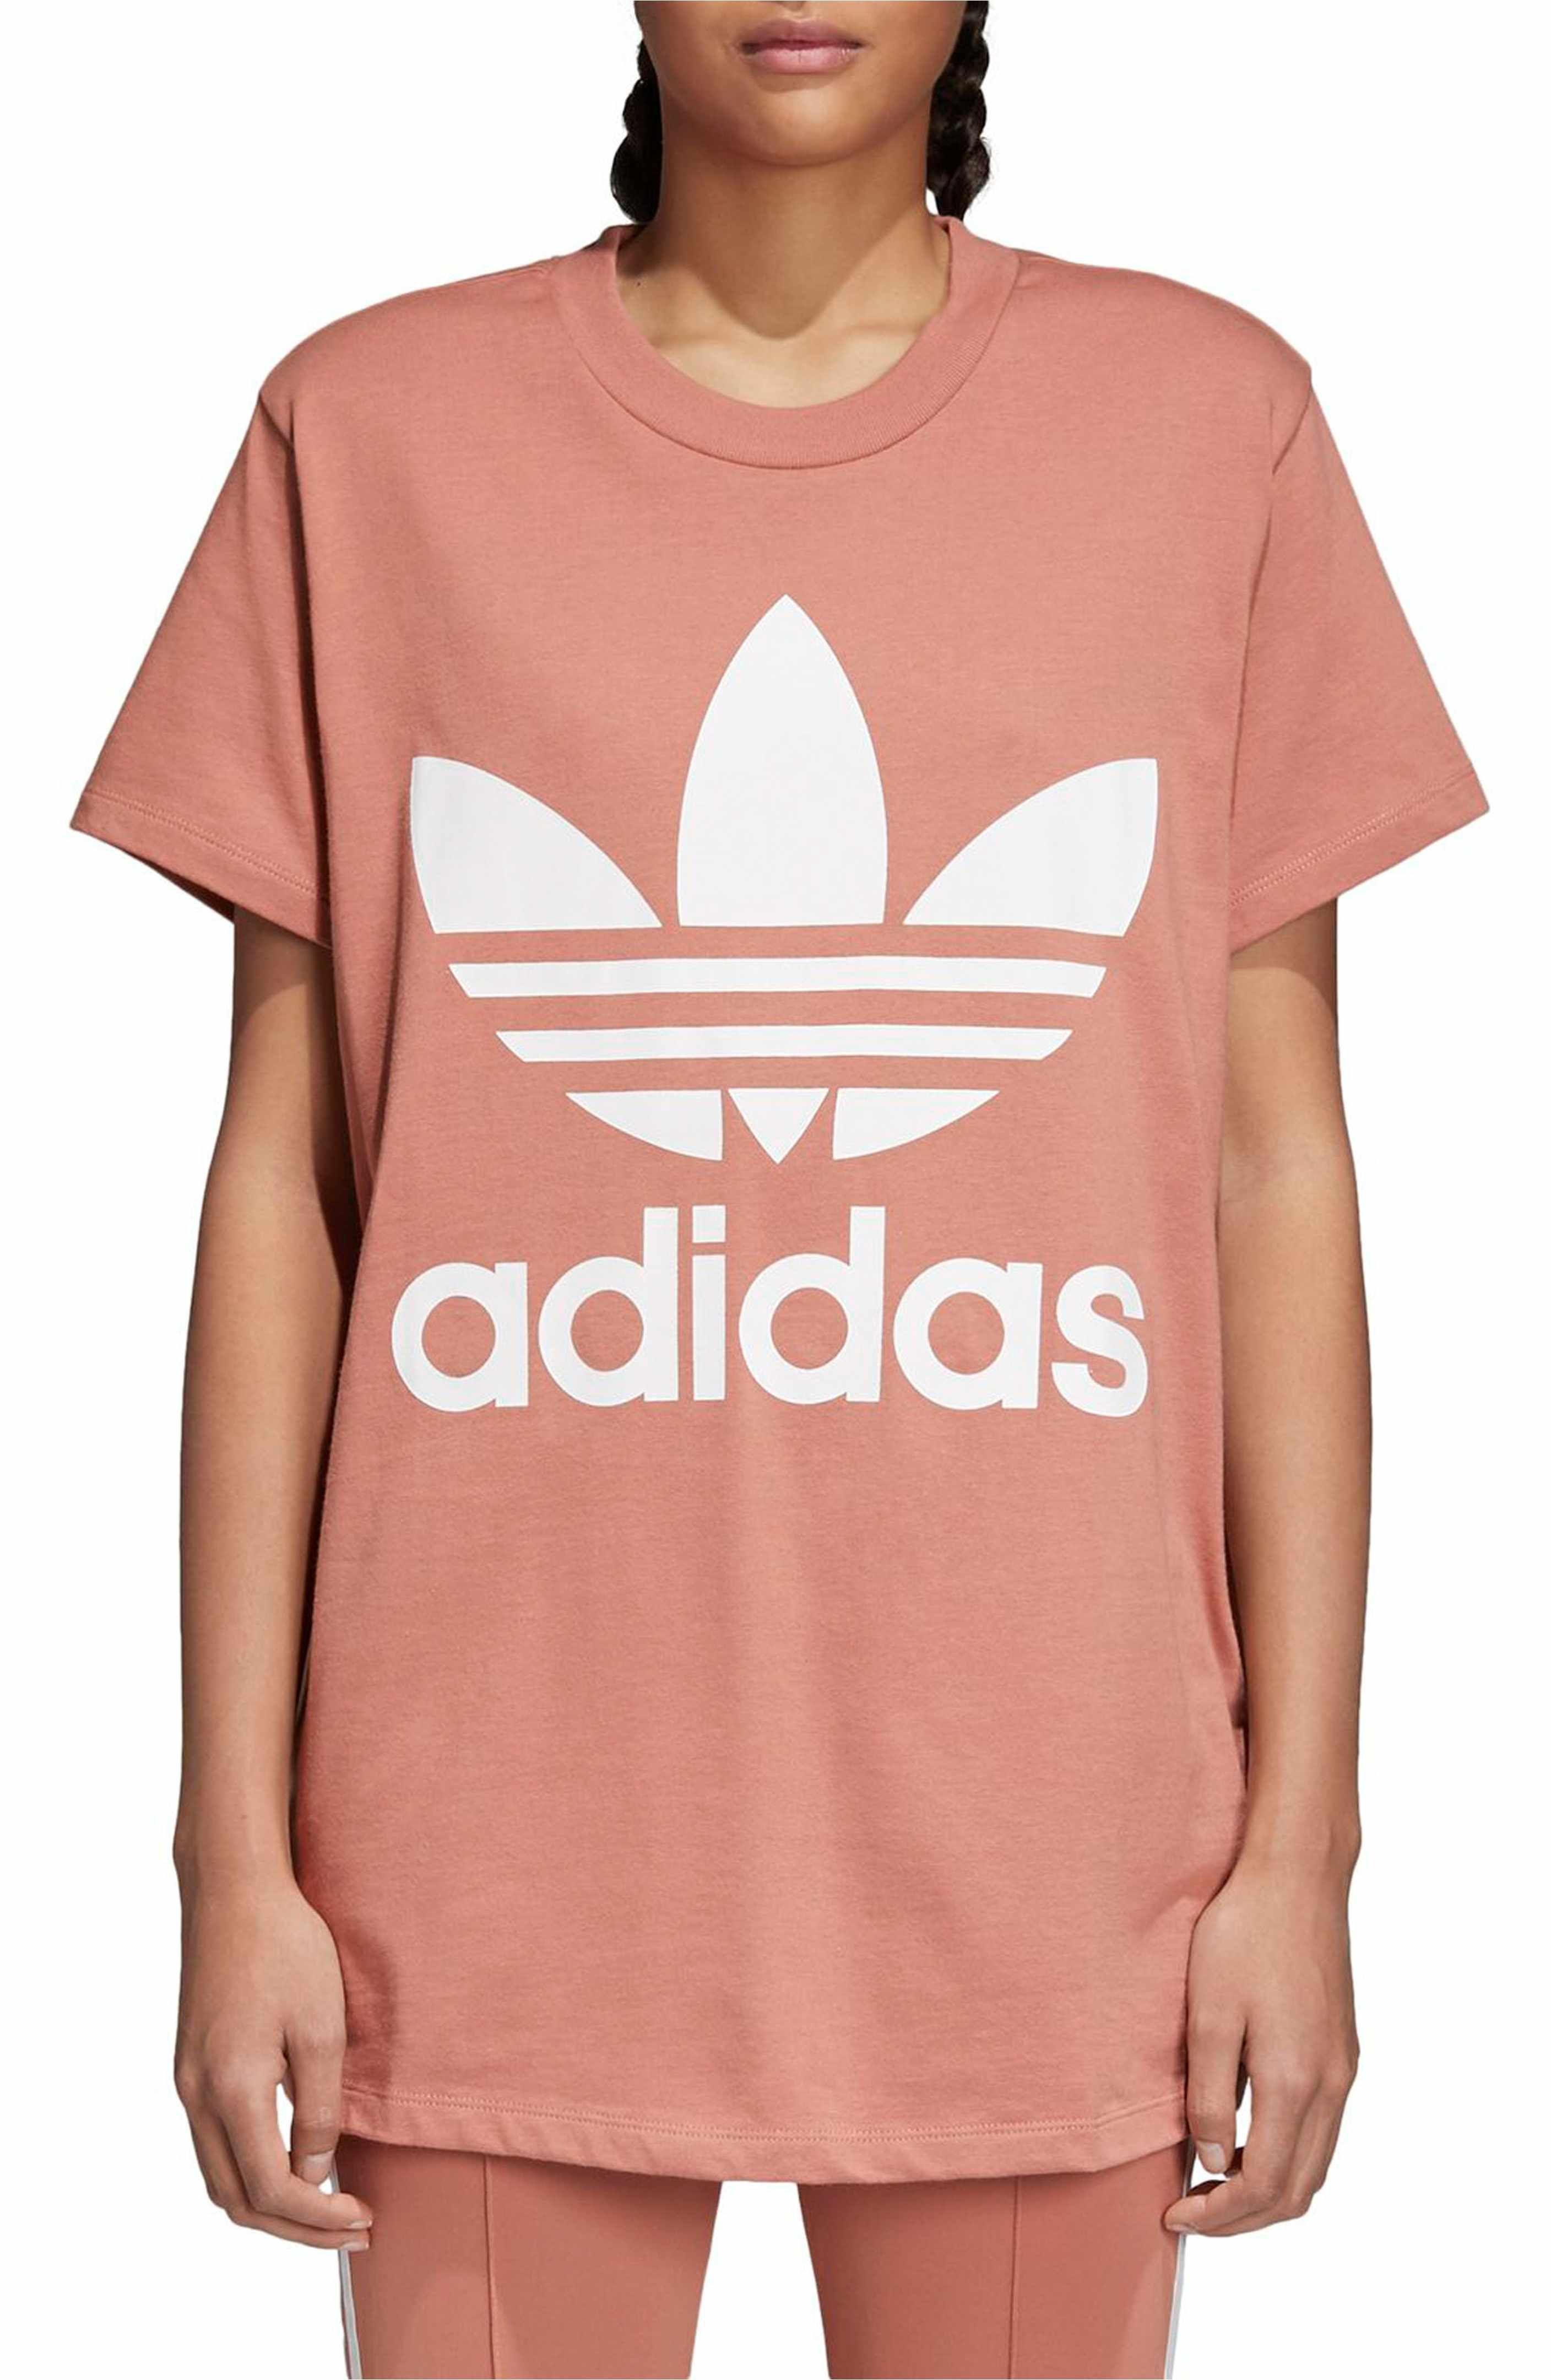 adidas Originals Trefoil Logo Tee | Womens workout outfits